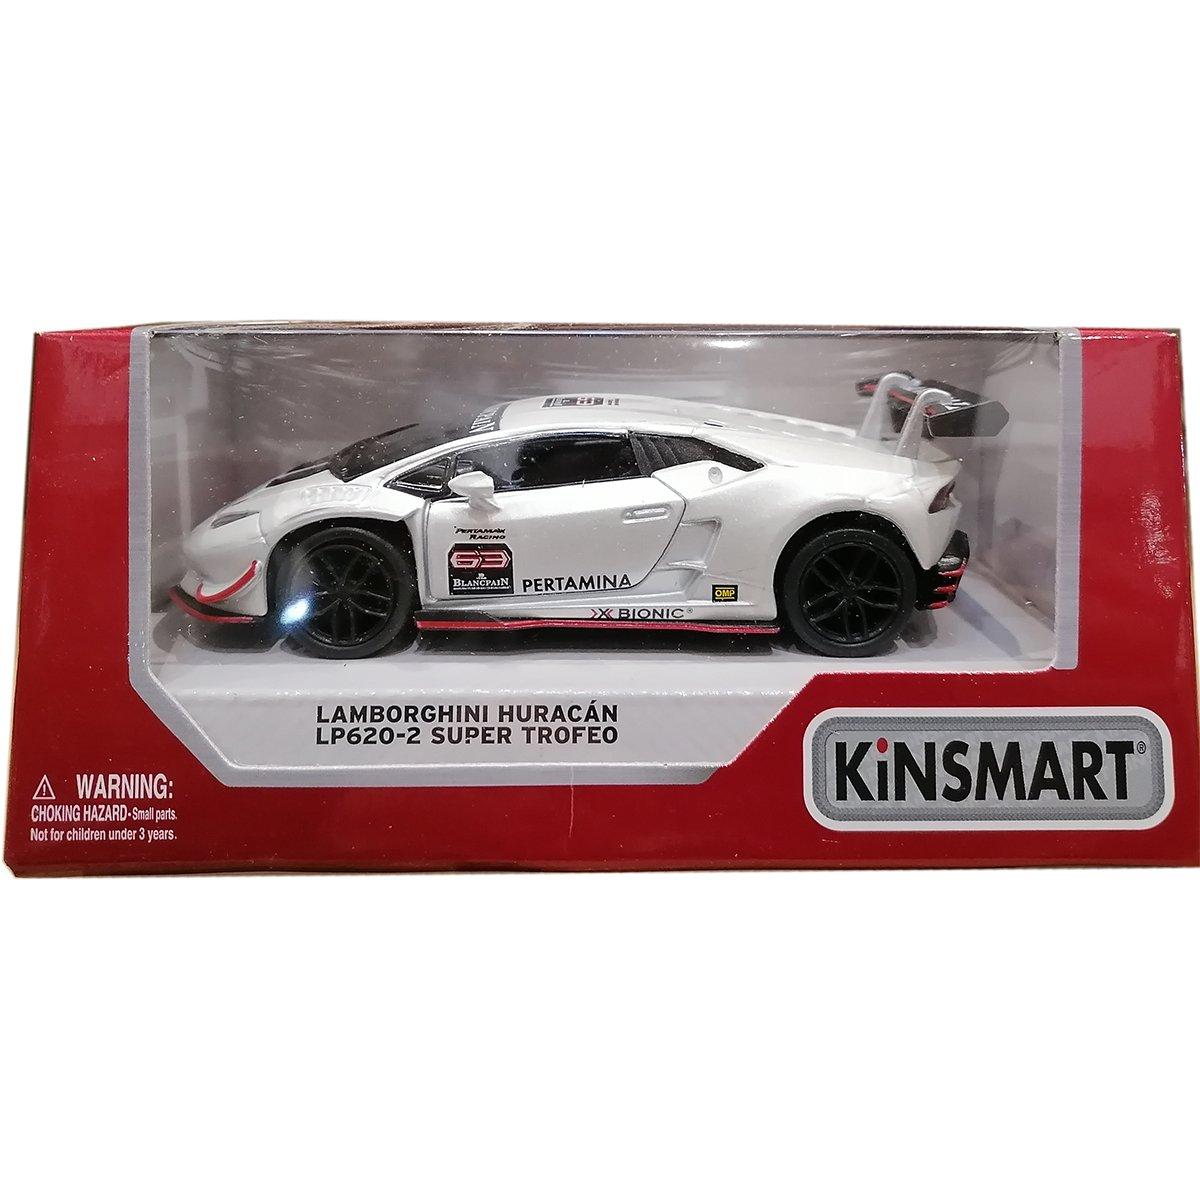 Masinuta din metal Kinsmart, Lamborghini Huracan, Alb